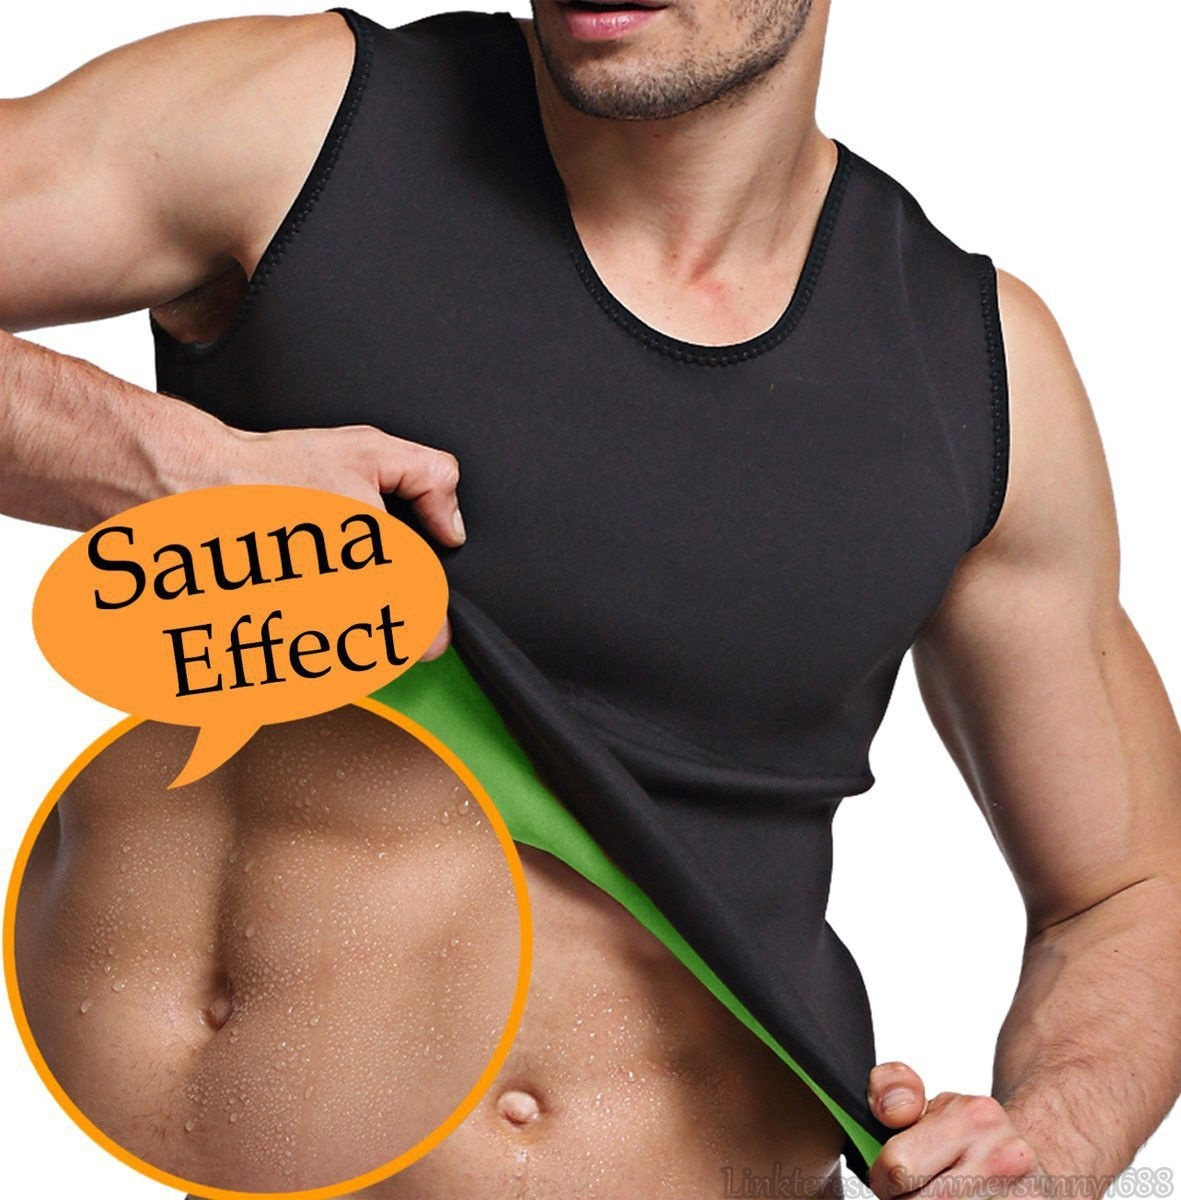 8a78183efd 2019 Hot Men Sport Fitness Gym Sauna Sweat Suit Body Shaper Belly ...